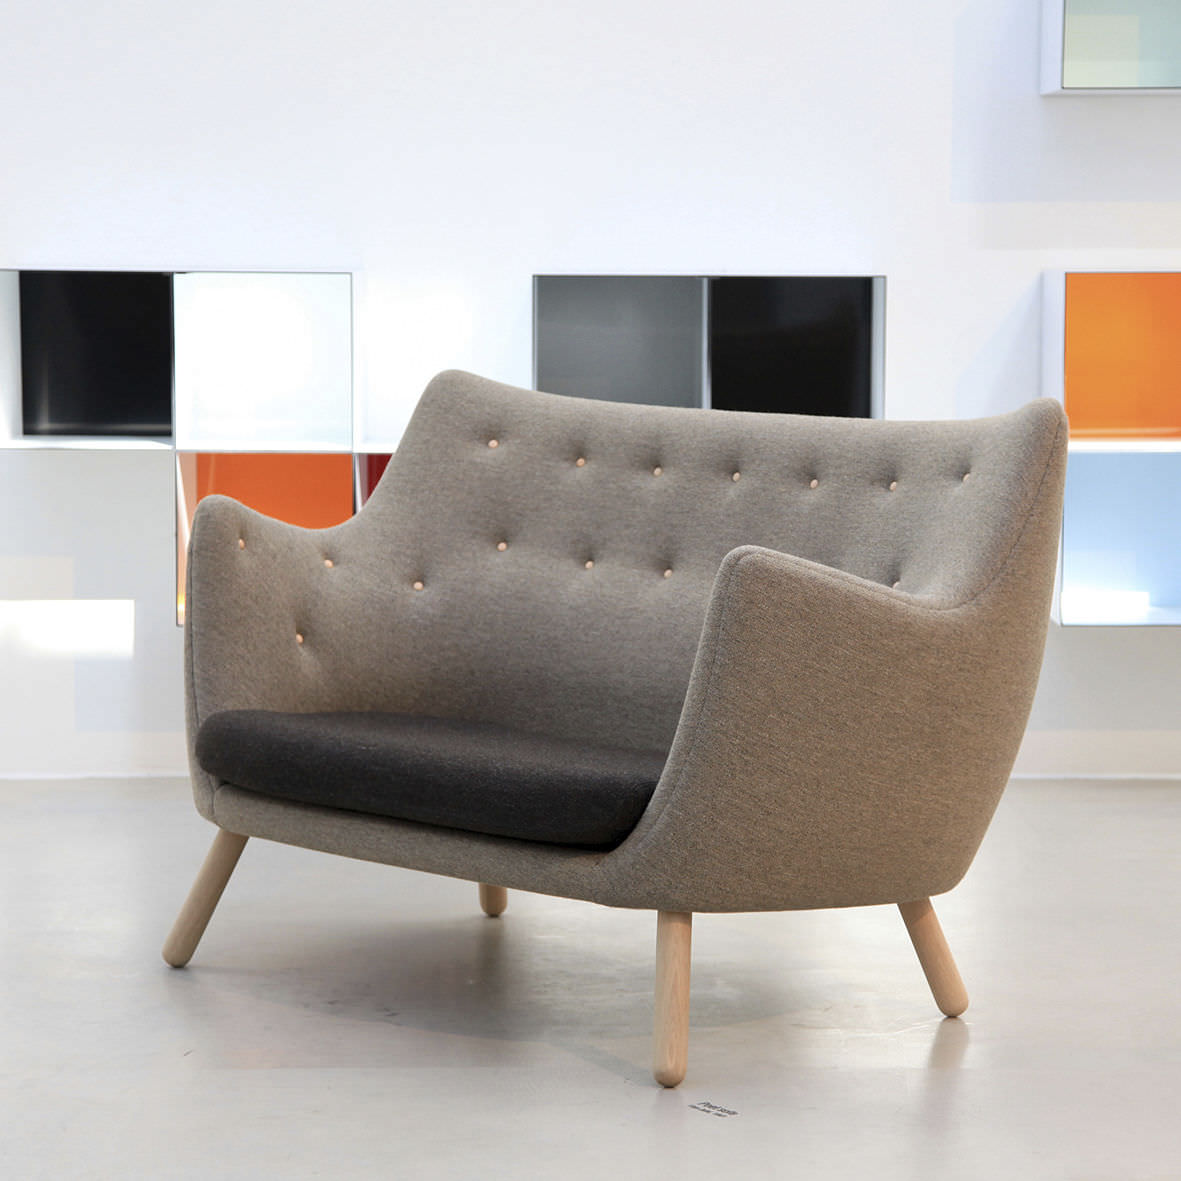 Scandinavian Design Sofa Wood Fabric By Finn Juhl Poet